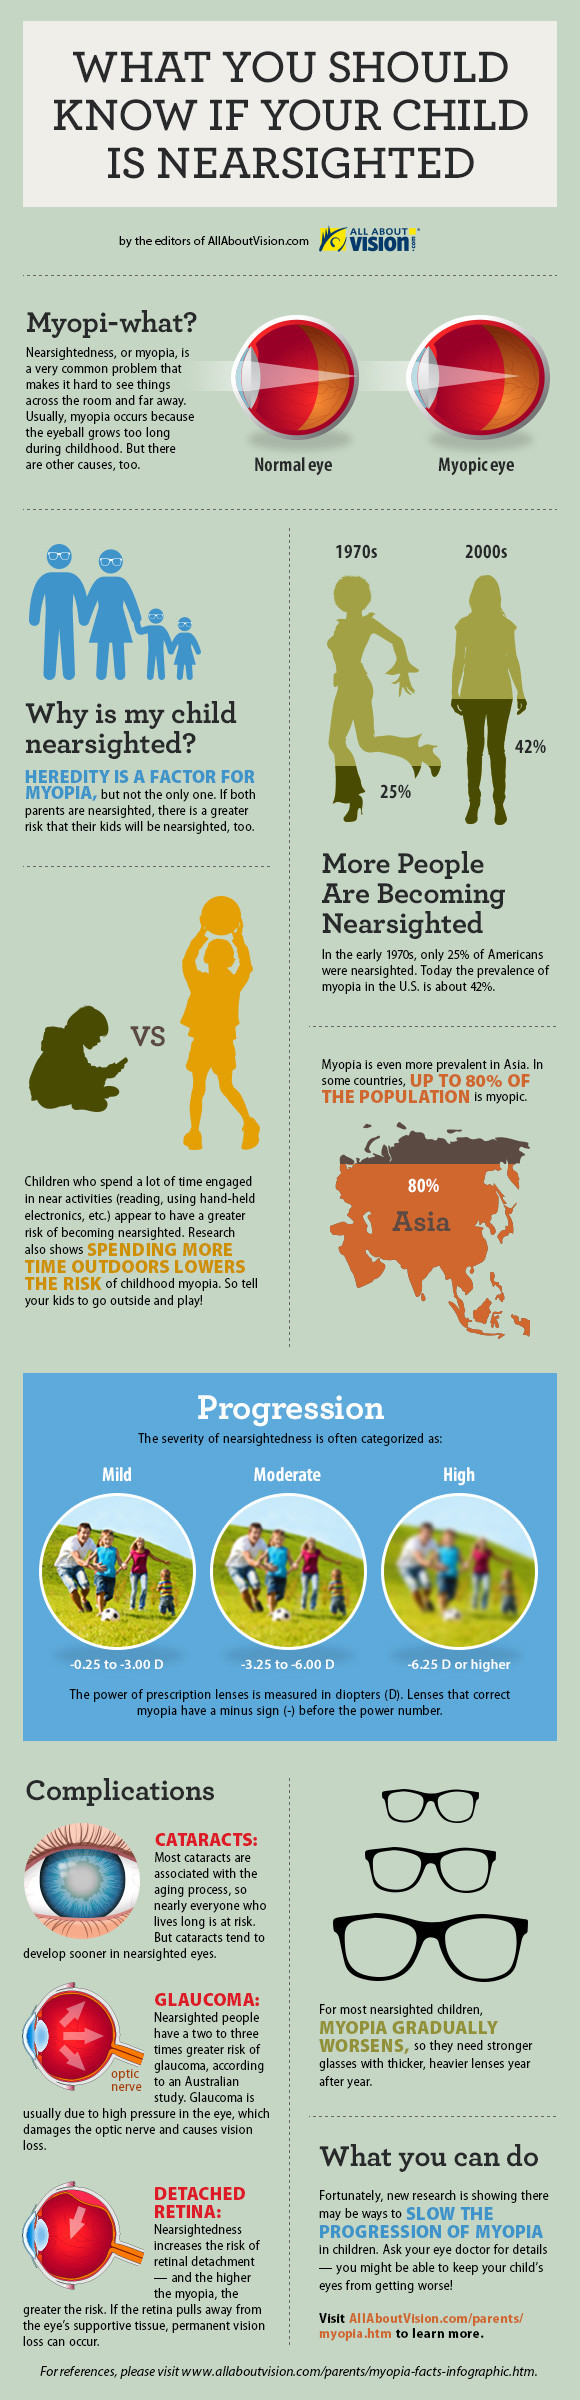 myopia-facts-infographic-580x2400.jpg